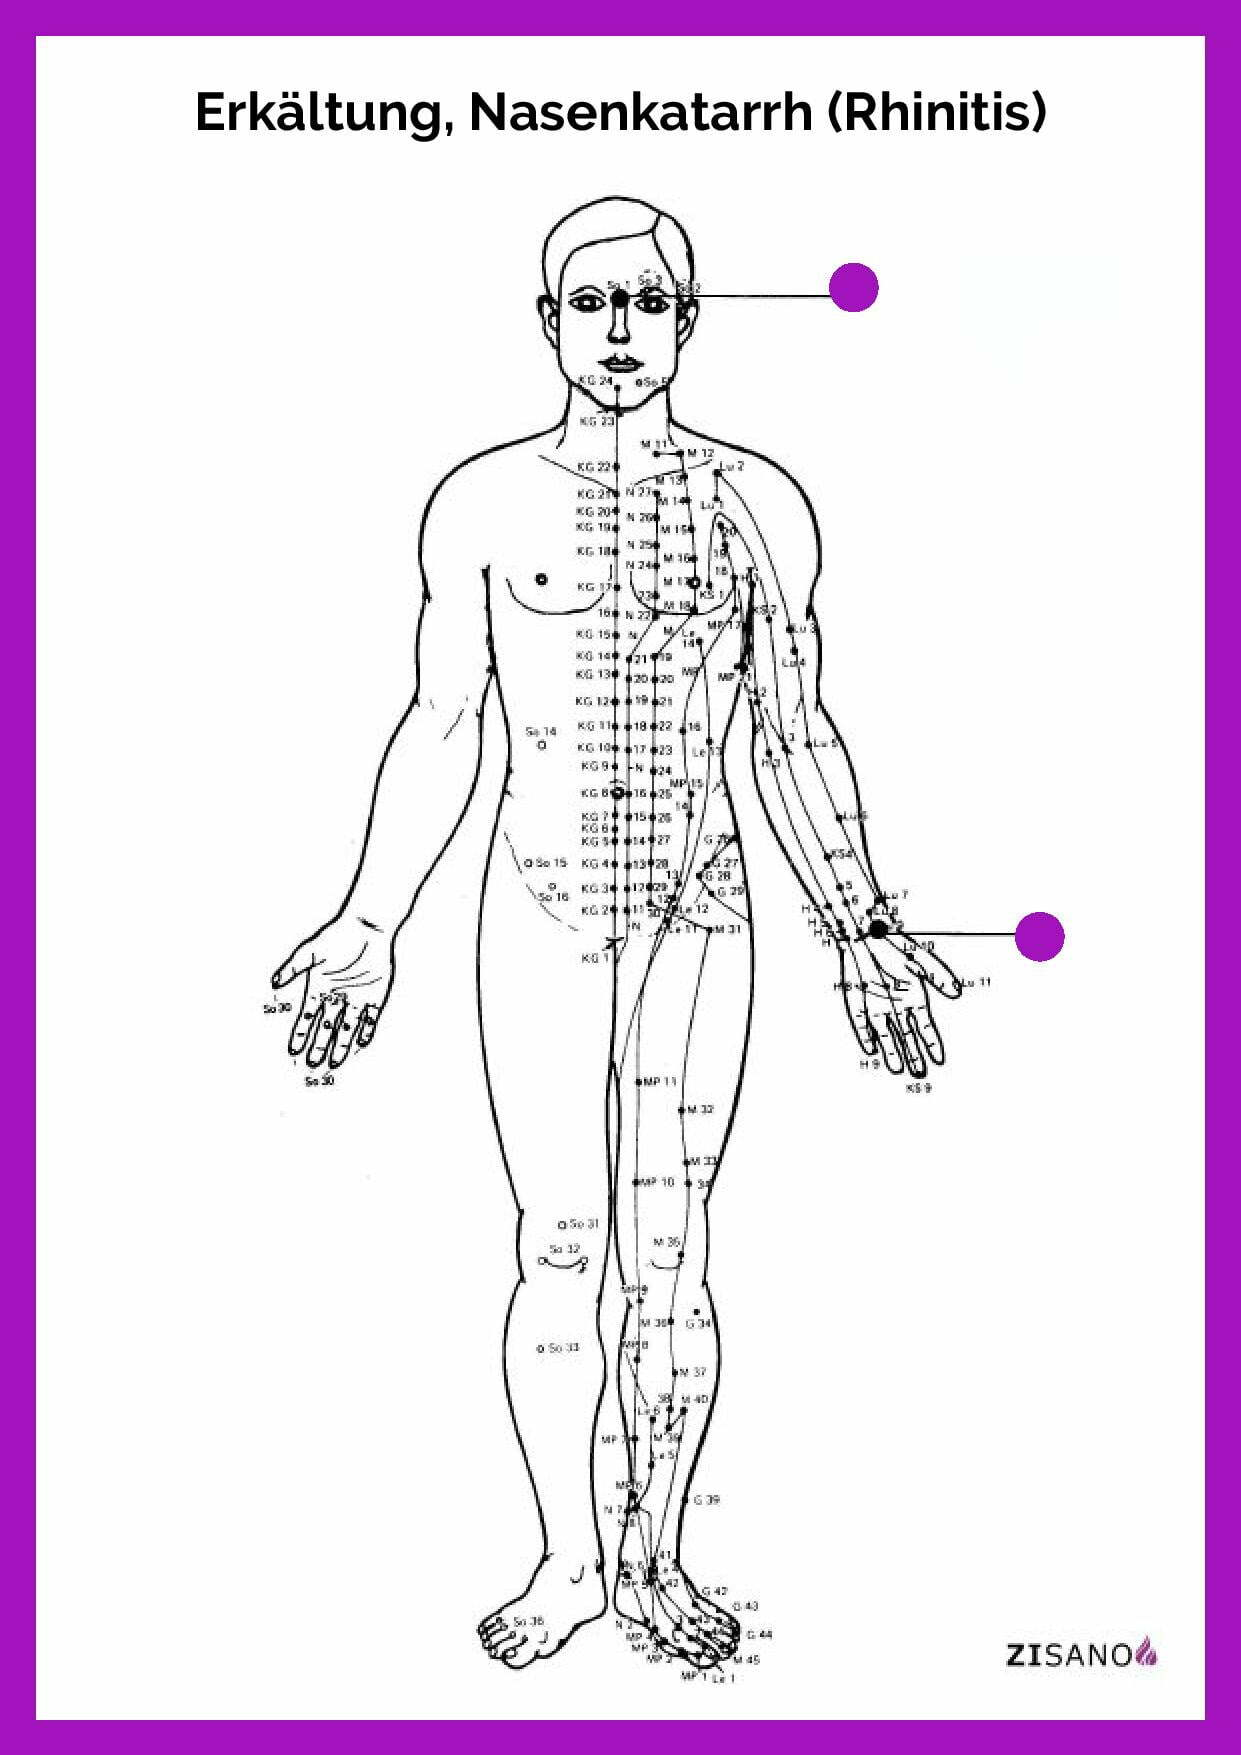 Meridiane - Erkältung, Nasenkatarrh (Rhinitis) - Behandlung